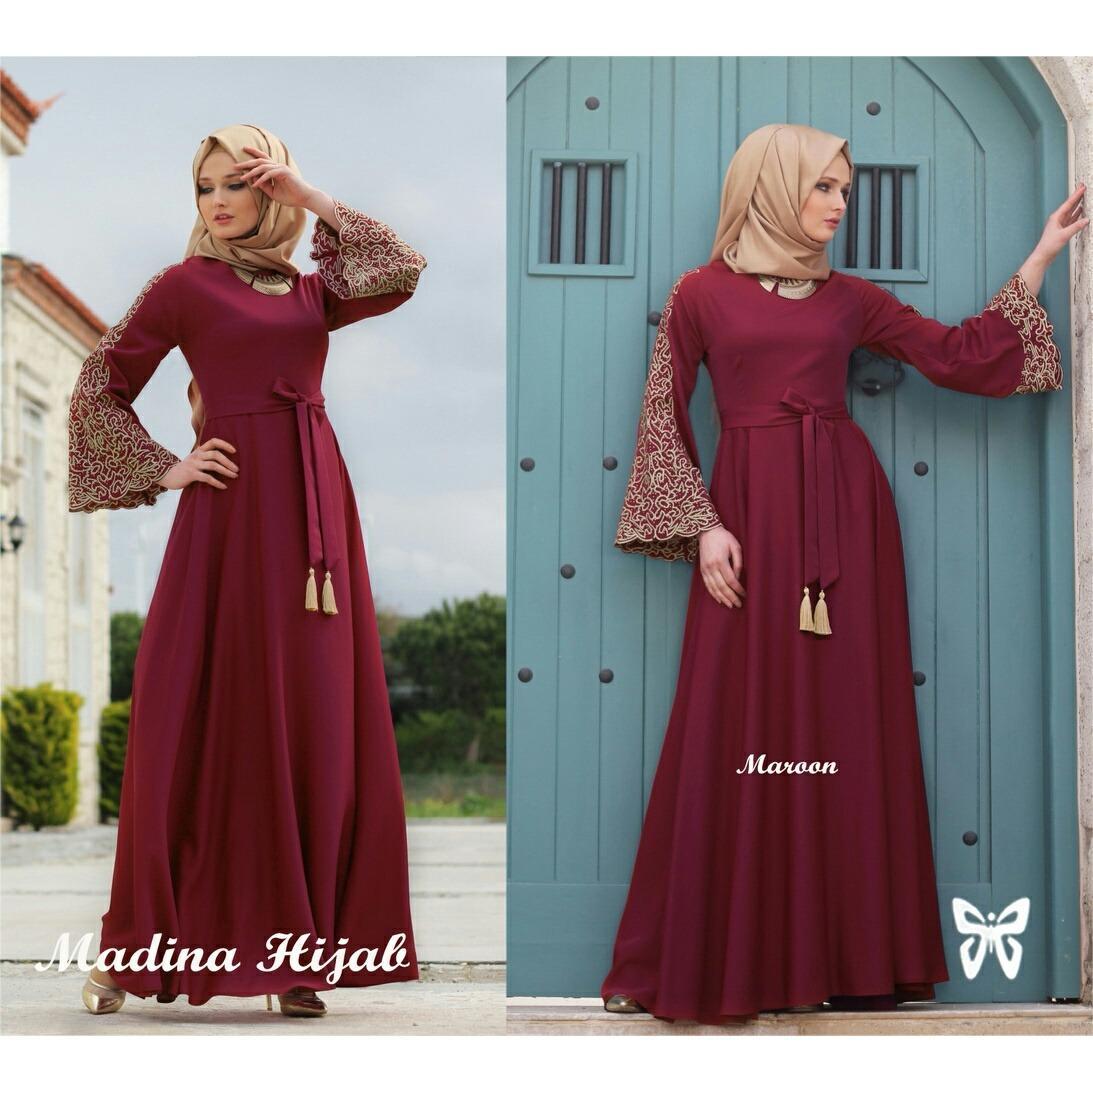 Gaun Kaos Oblong Wanita Aneka Warna Santai Merah Daftar Update Source · model baju batik atasan